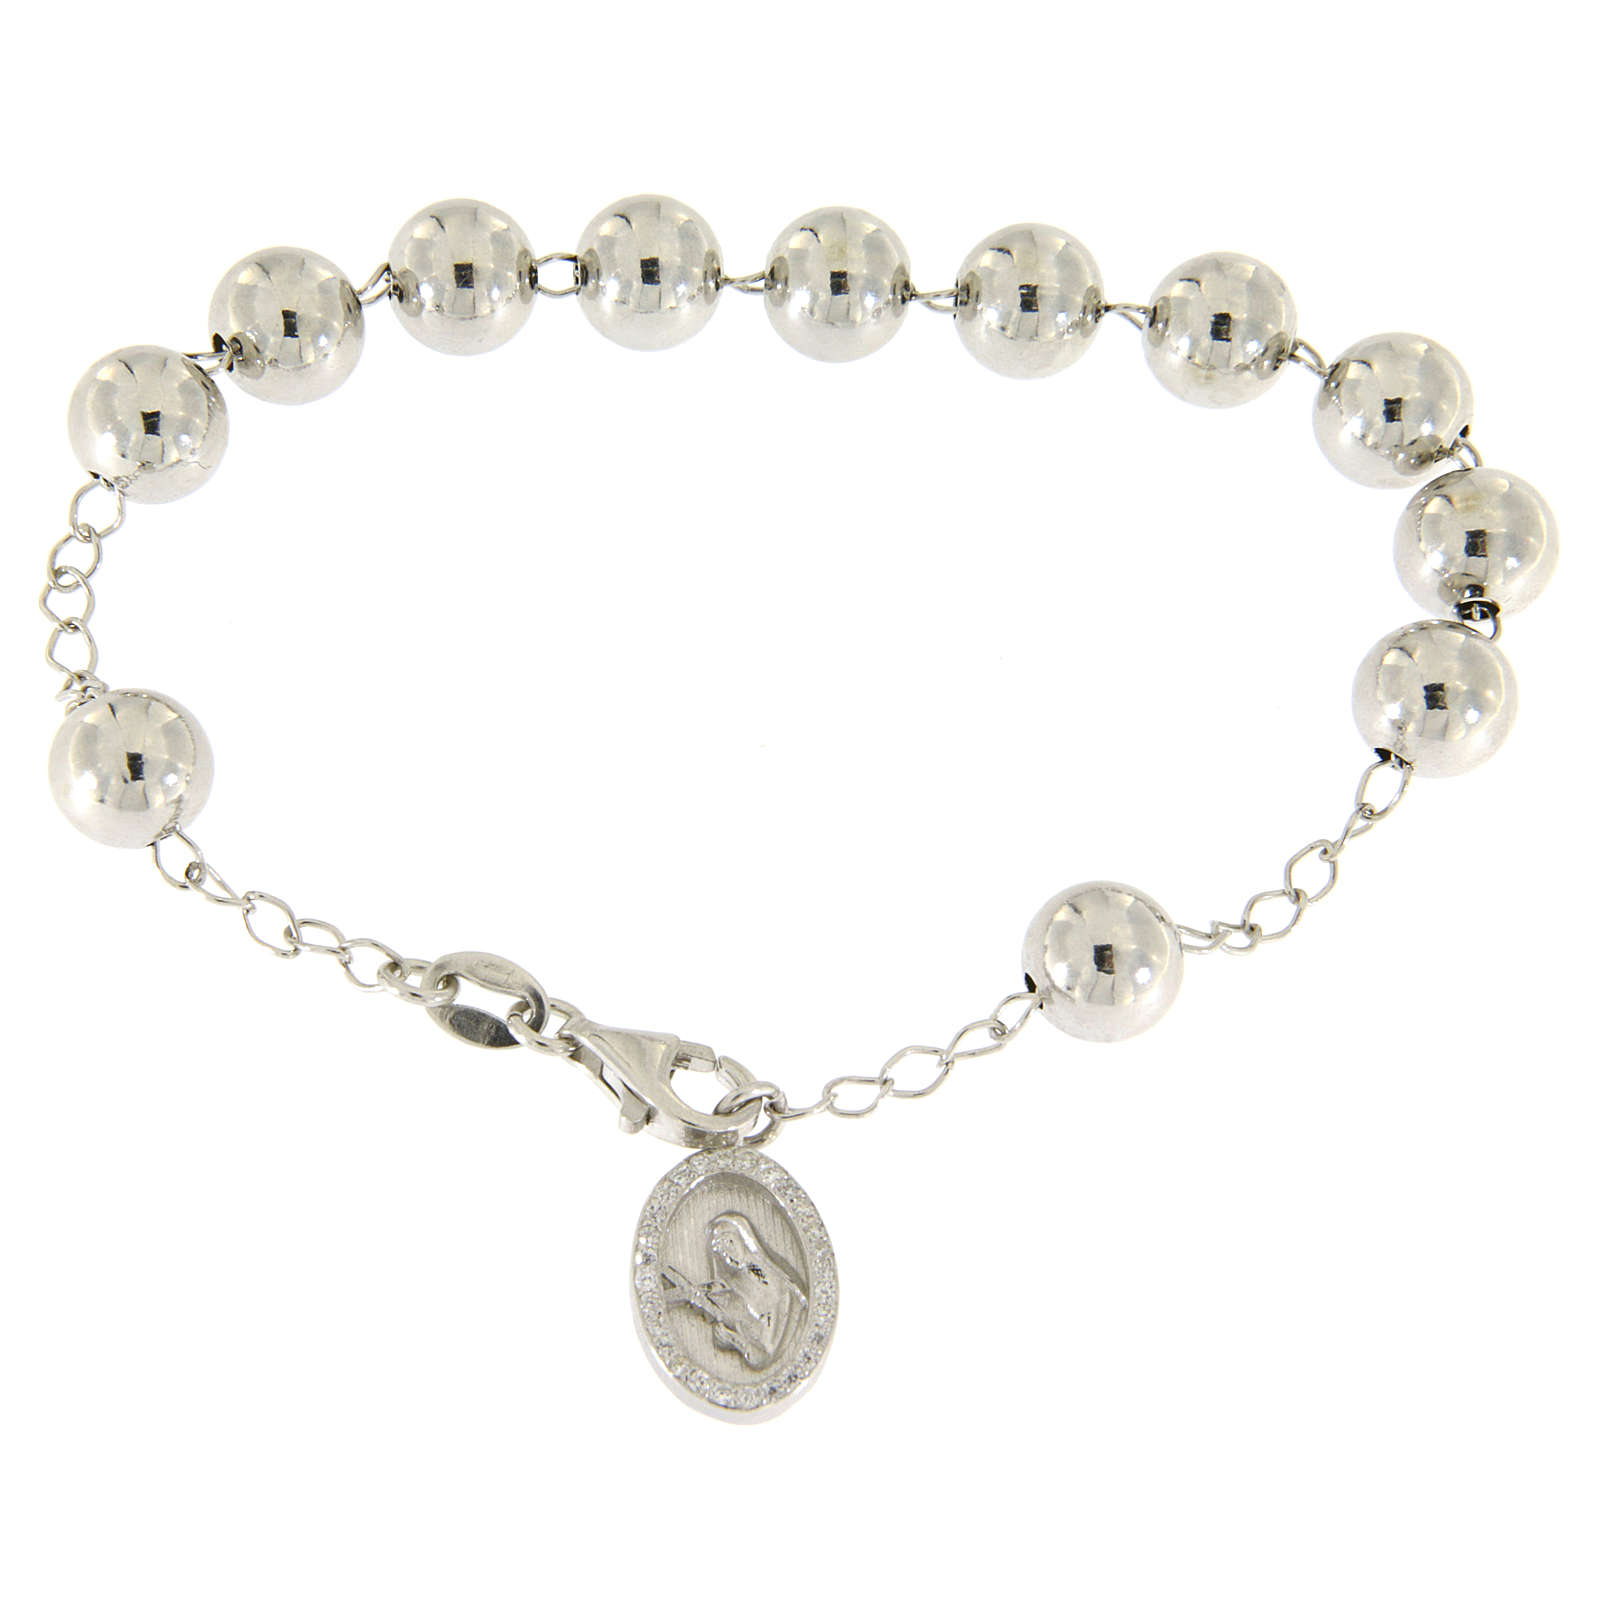 Bracciale religioso argento 925 pallina 8 mm S. Rita zirconi bianchi 4